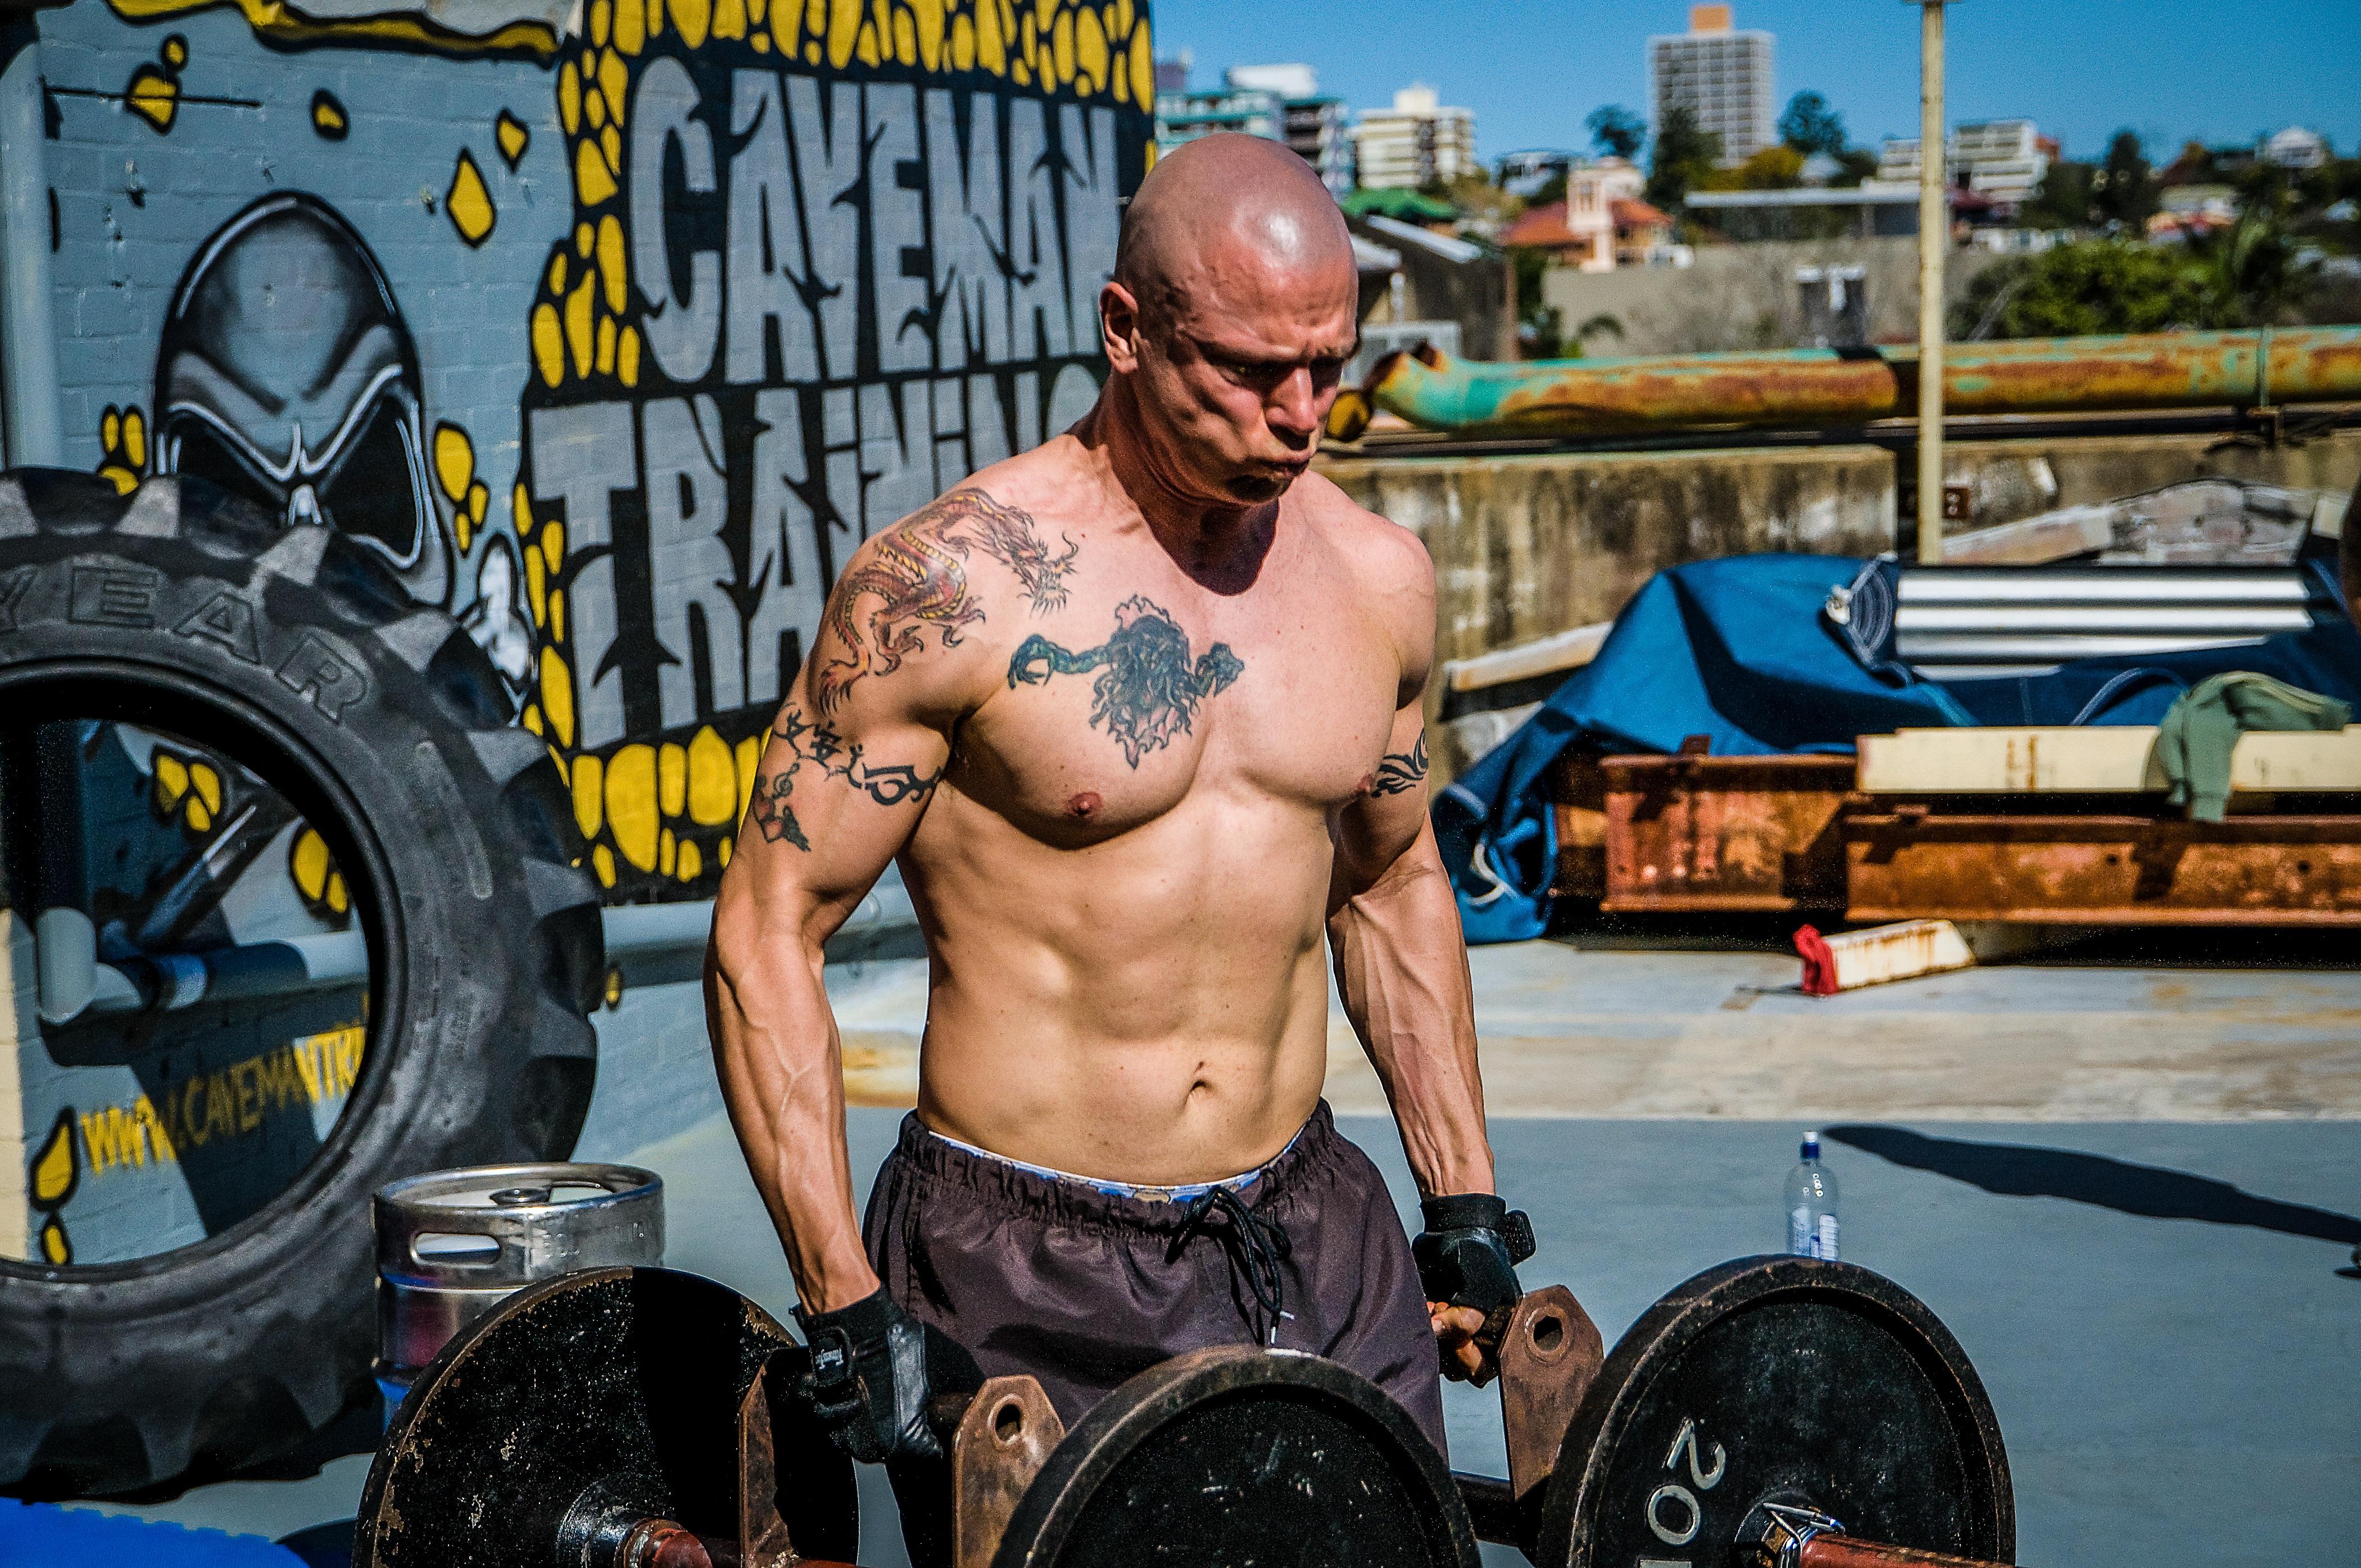 Heavy weight endurance training